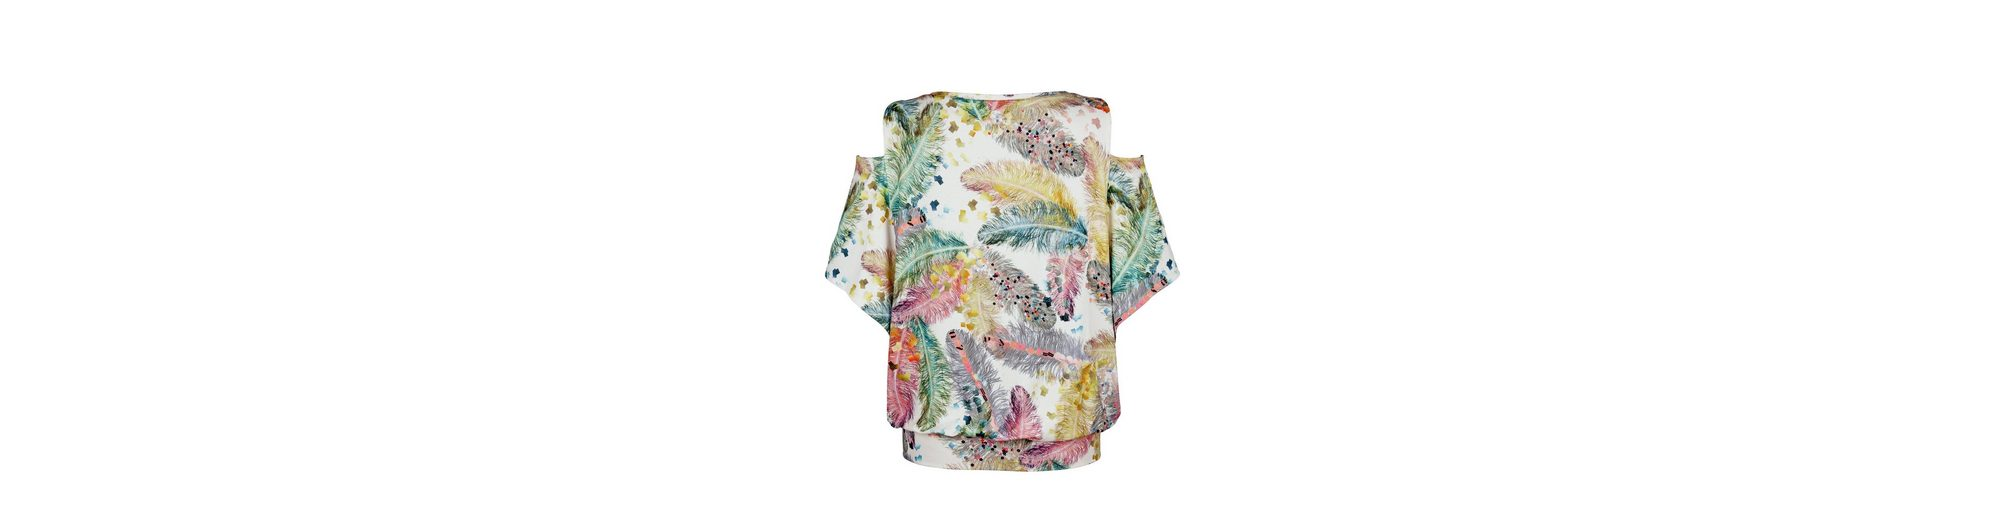 Alba freier Federprint Schulter Shirt Alba Moda Moda und mit rfqnwHUr6T